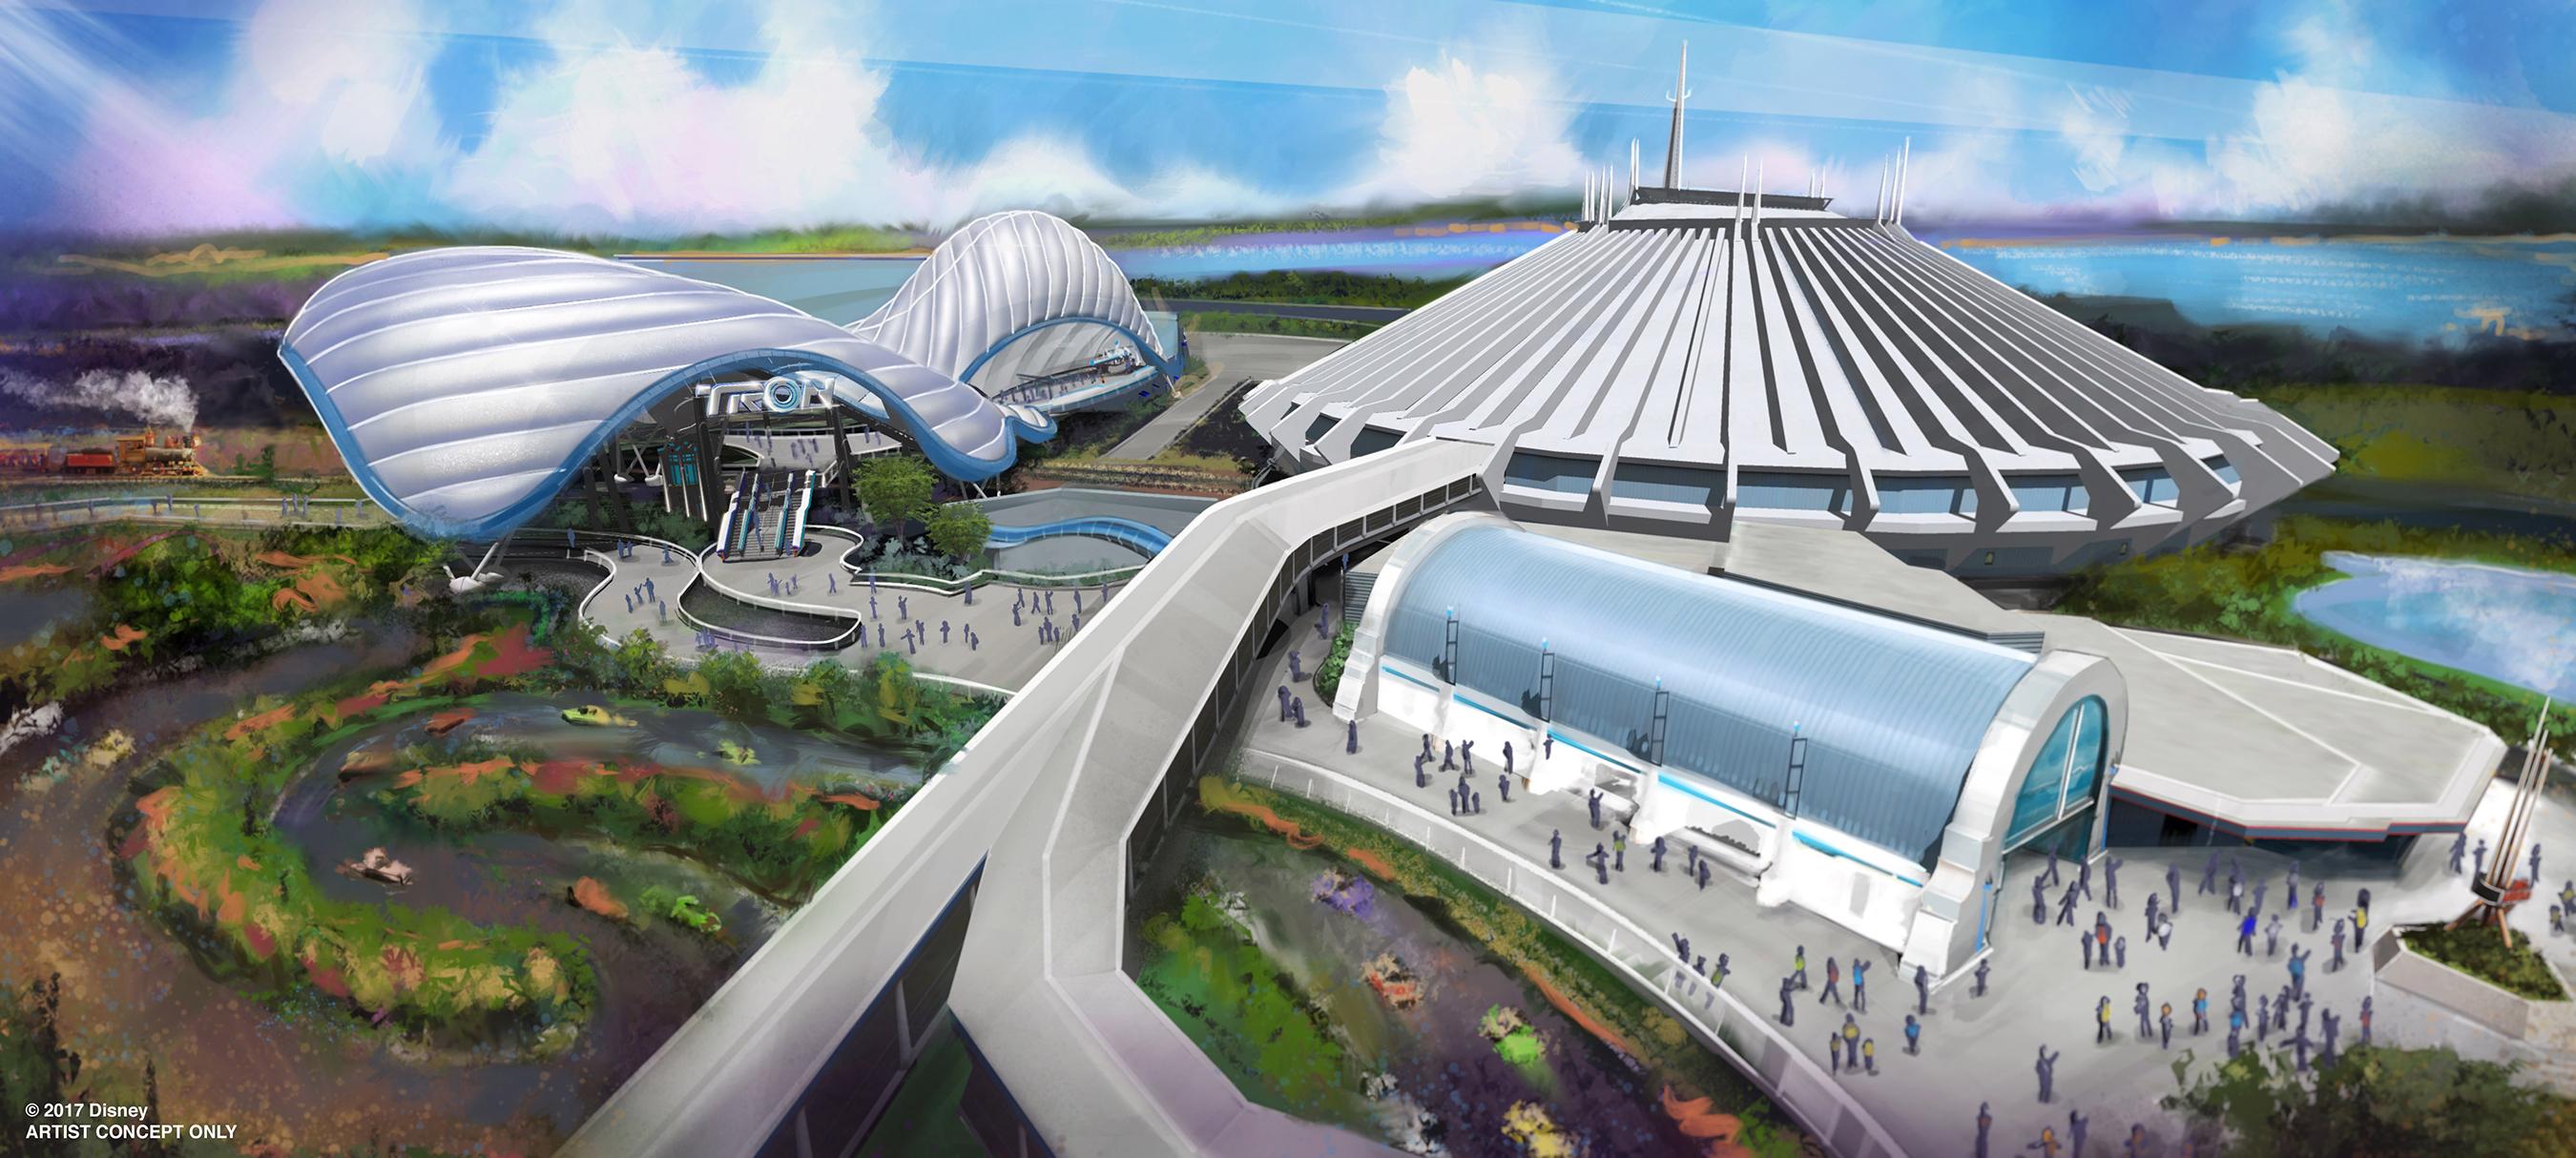 Tron-themed attraction Magic Kingdom